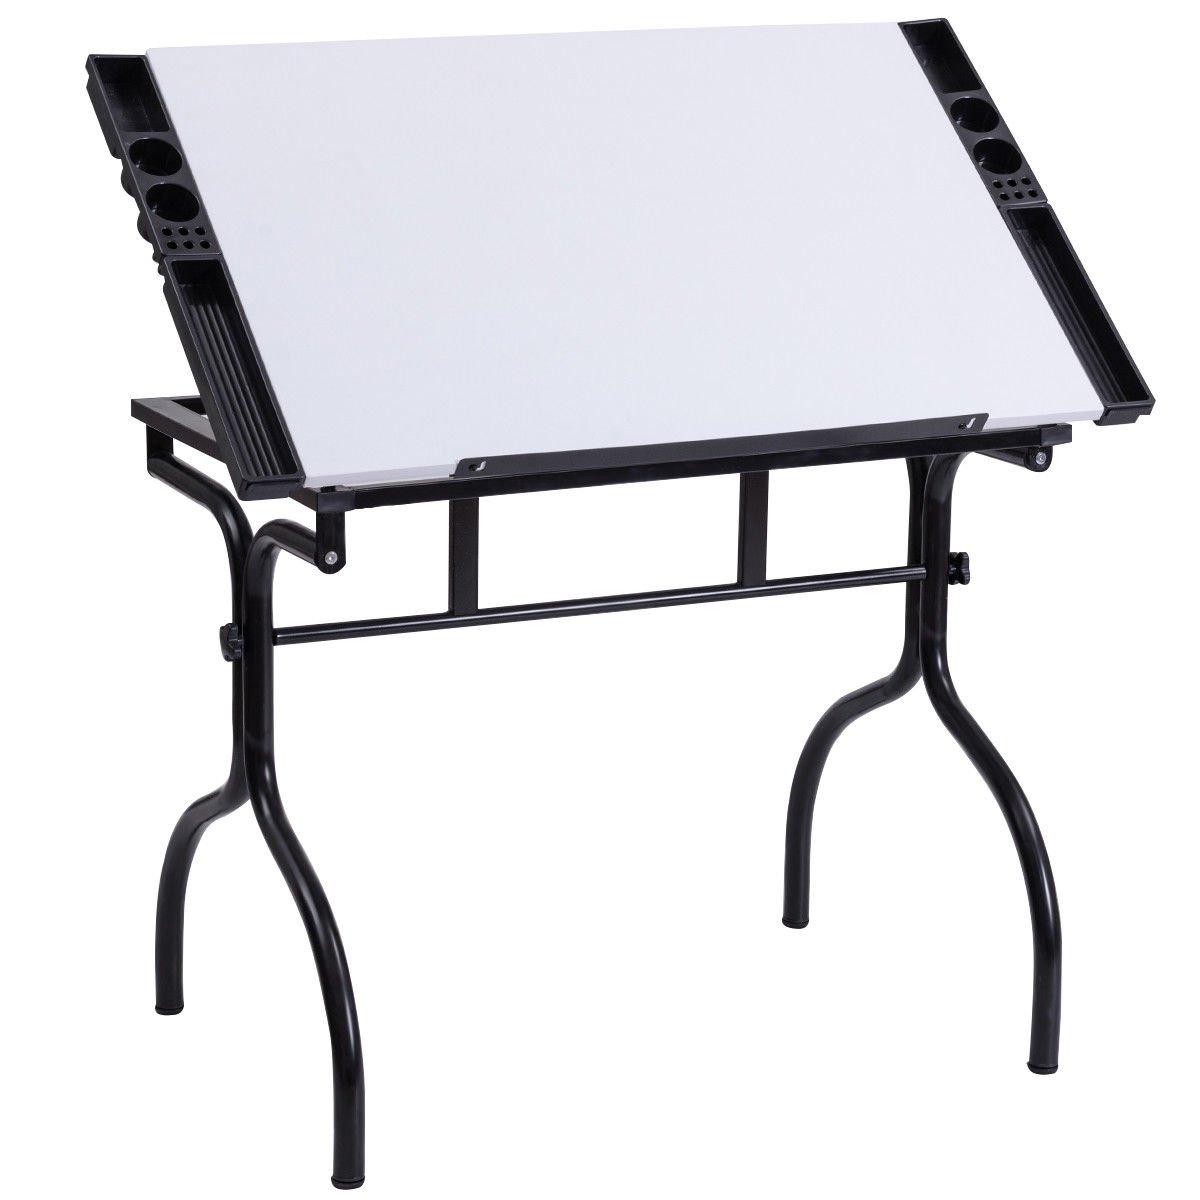 Miraculous Buy Tangkula Adjustable Drafting Table Folding Hobby Studio Creativecarmelina Interior Chair Design Creativecarmelinacom